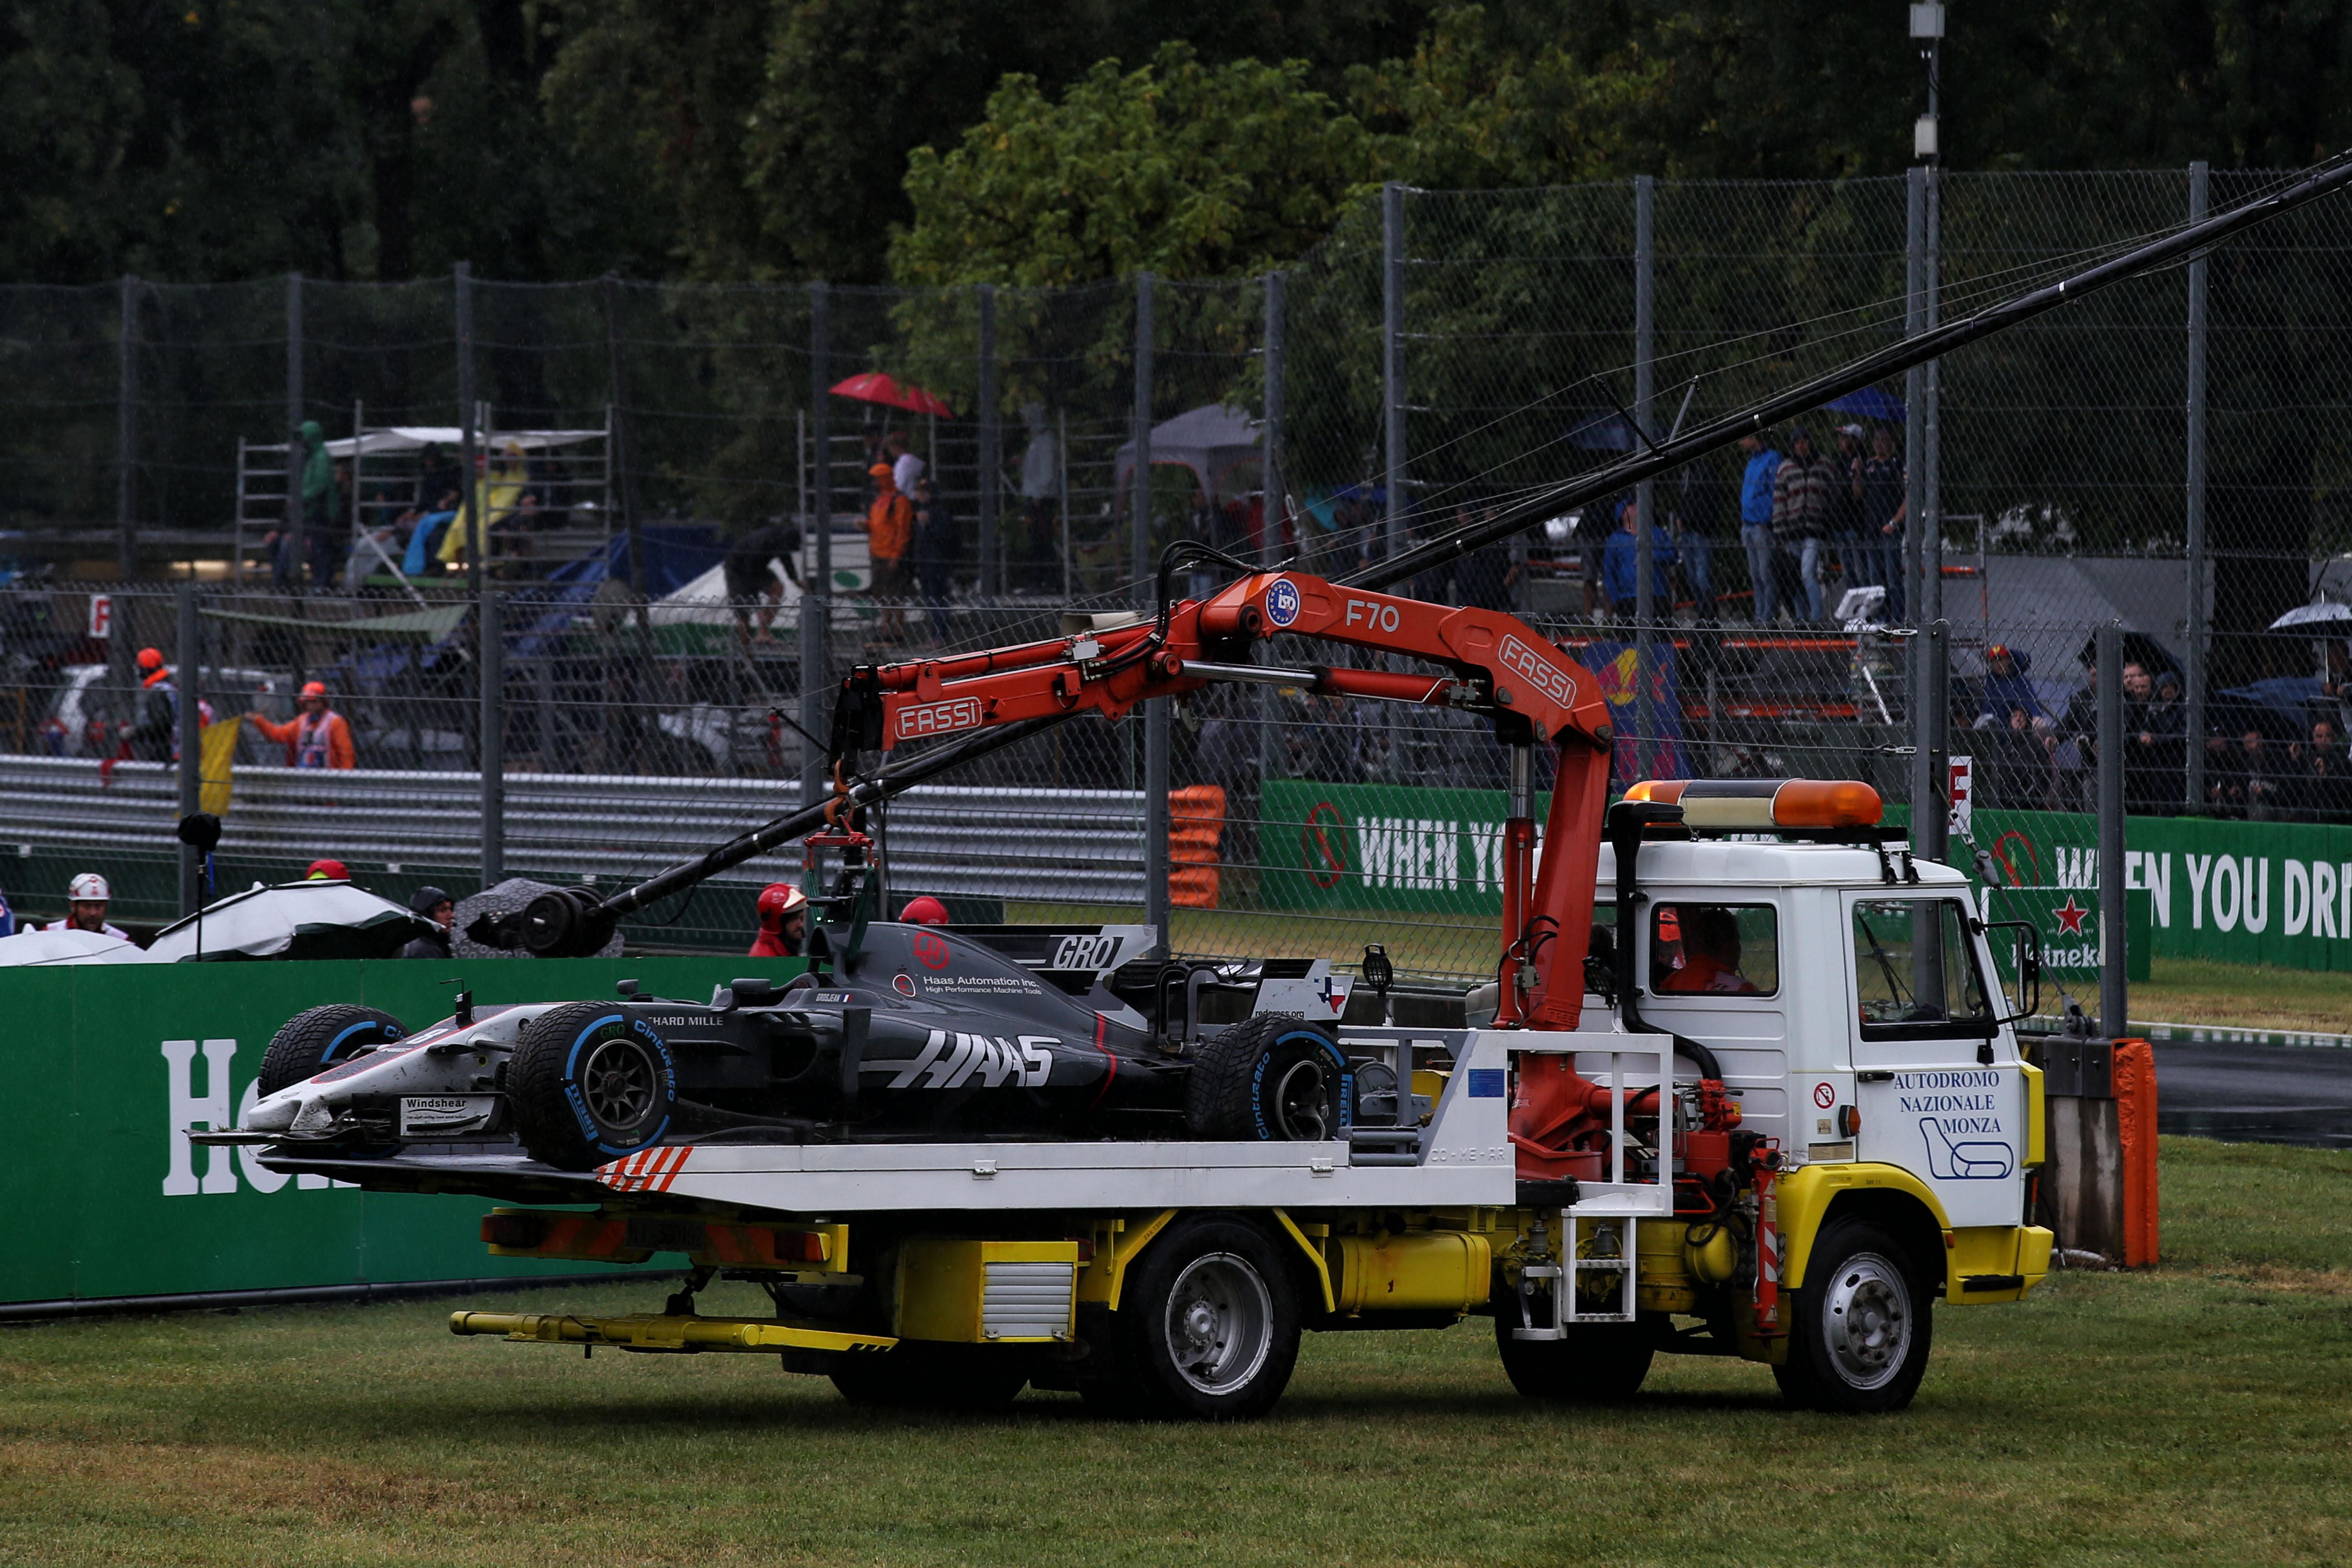 Motor Racing Formula One World Championship Italian Grand Prix Qualifying Day Monza, Italy